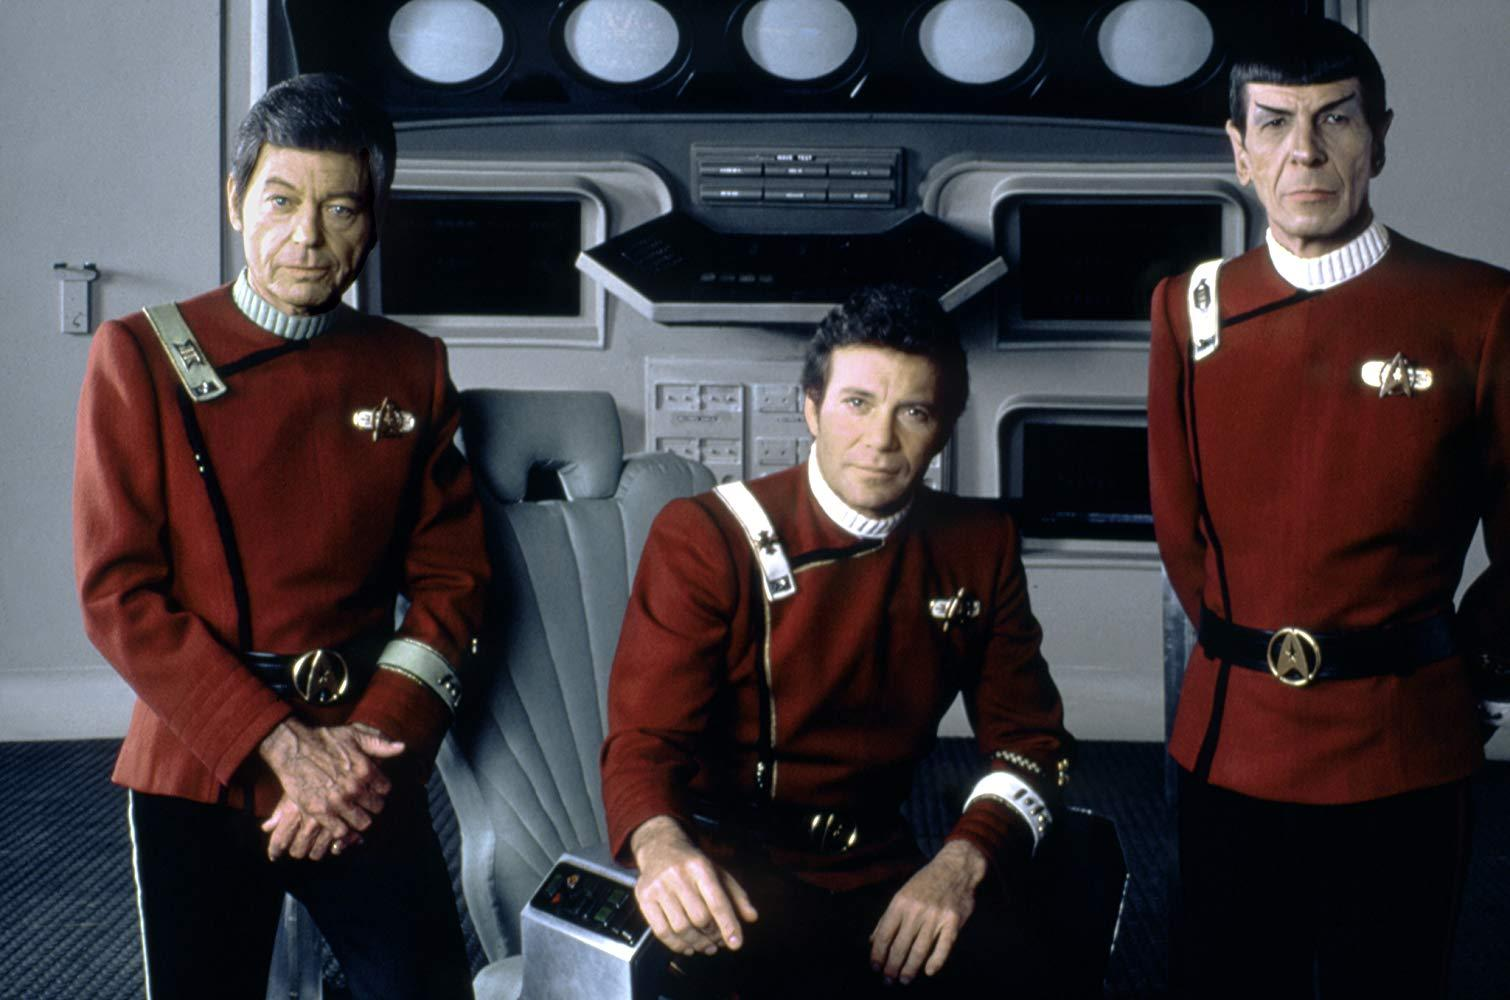 مشاهدة فيلم Star Trek II The Wrath Of Khan 1982 HD مترجم كامل اون لاين